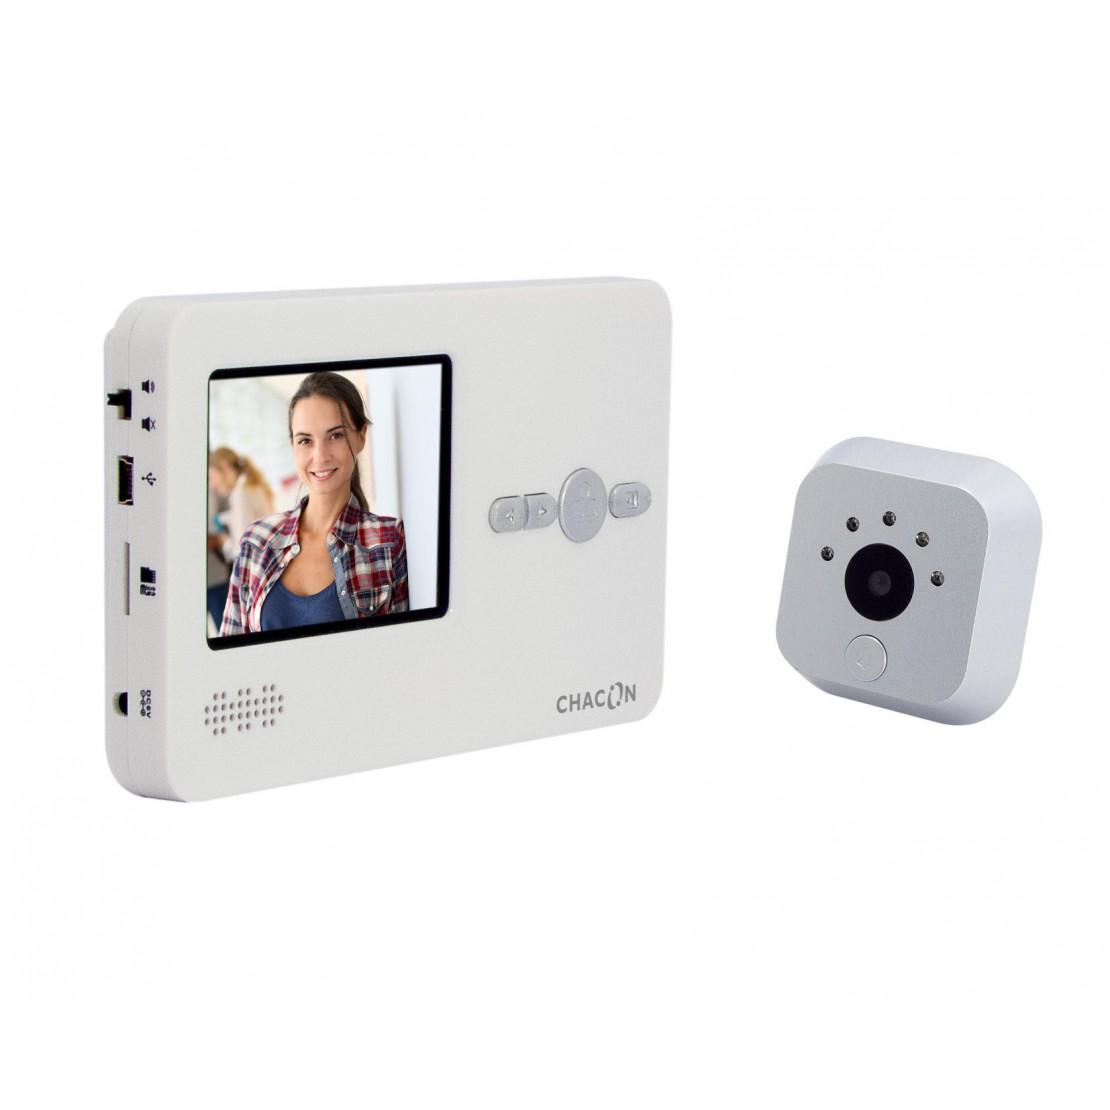 Digitale spion met 2,8 inch-lcd-scherm